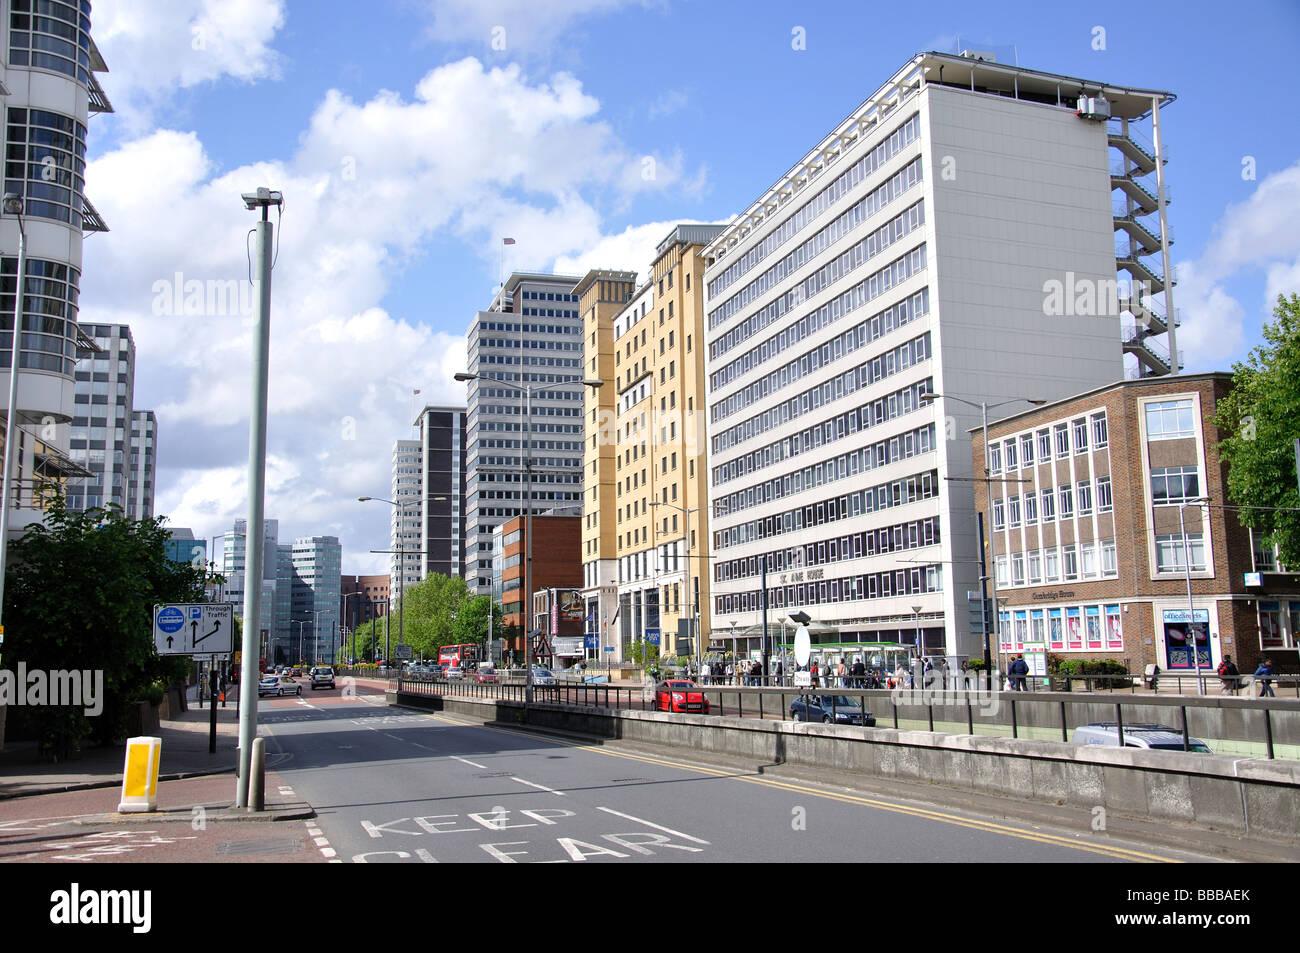 Wellesley Road, Croydon, London Borough of Croydon, Greater London, England, United Kingdom - Stock Image